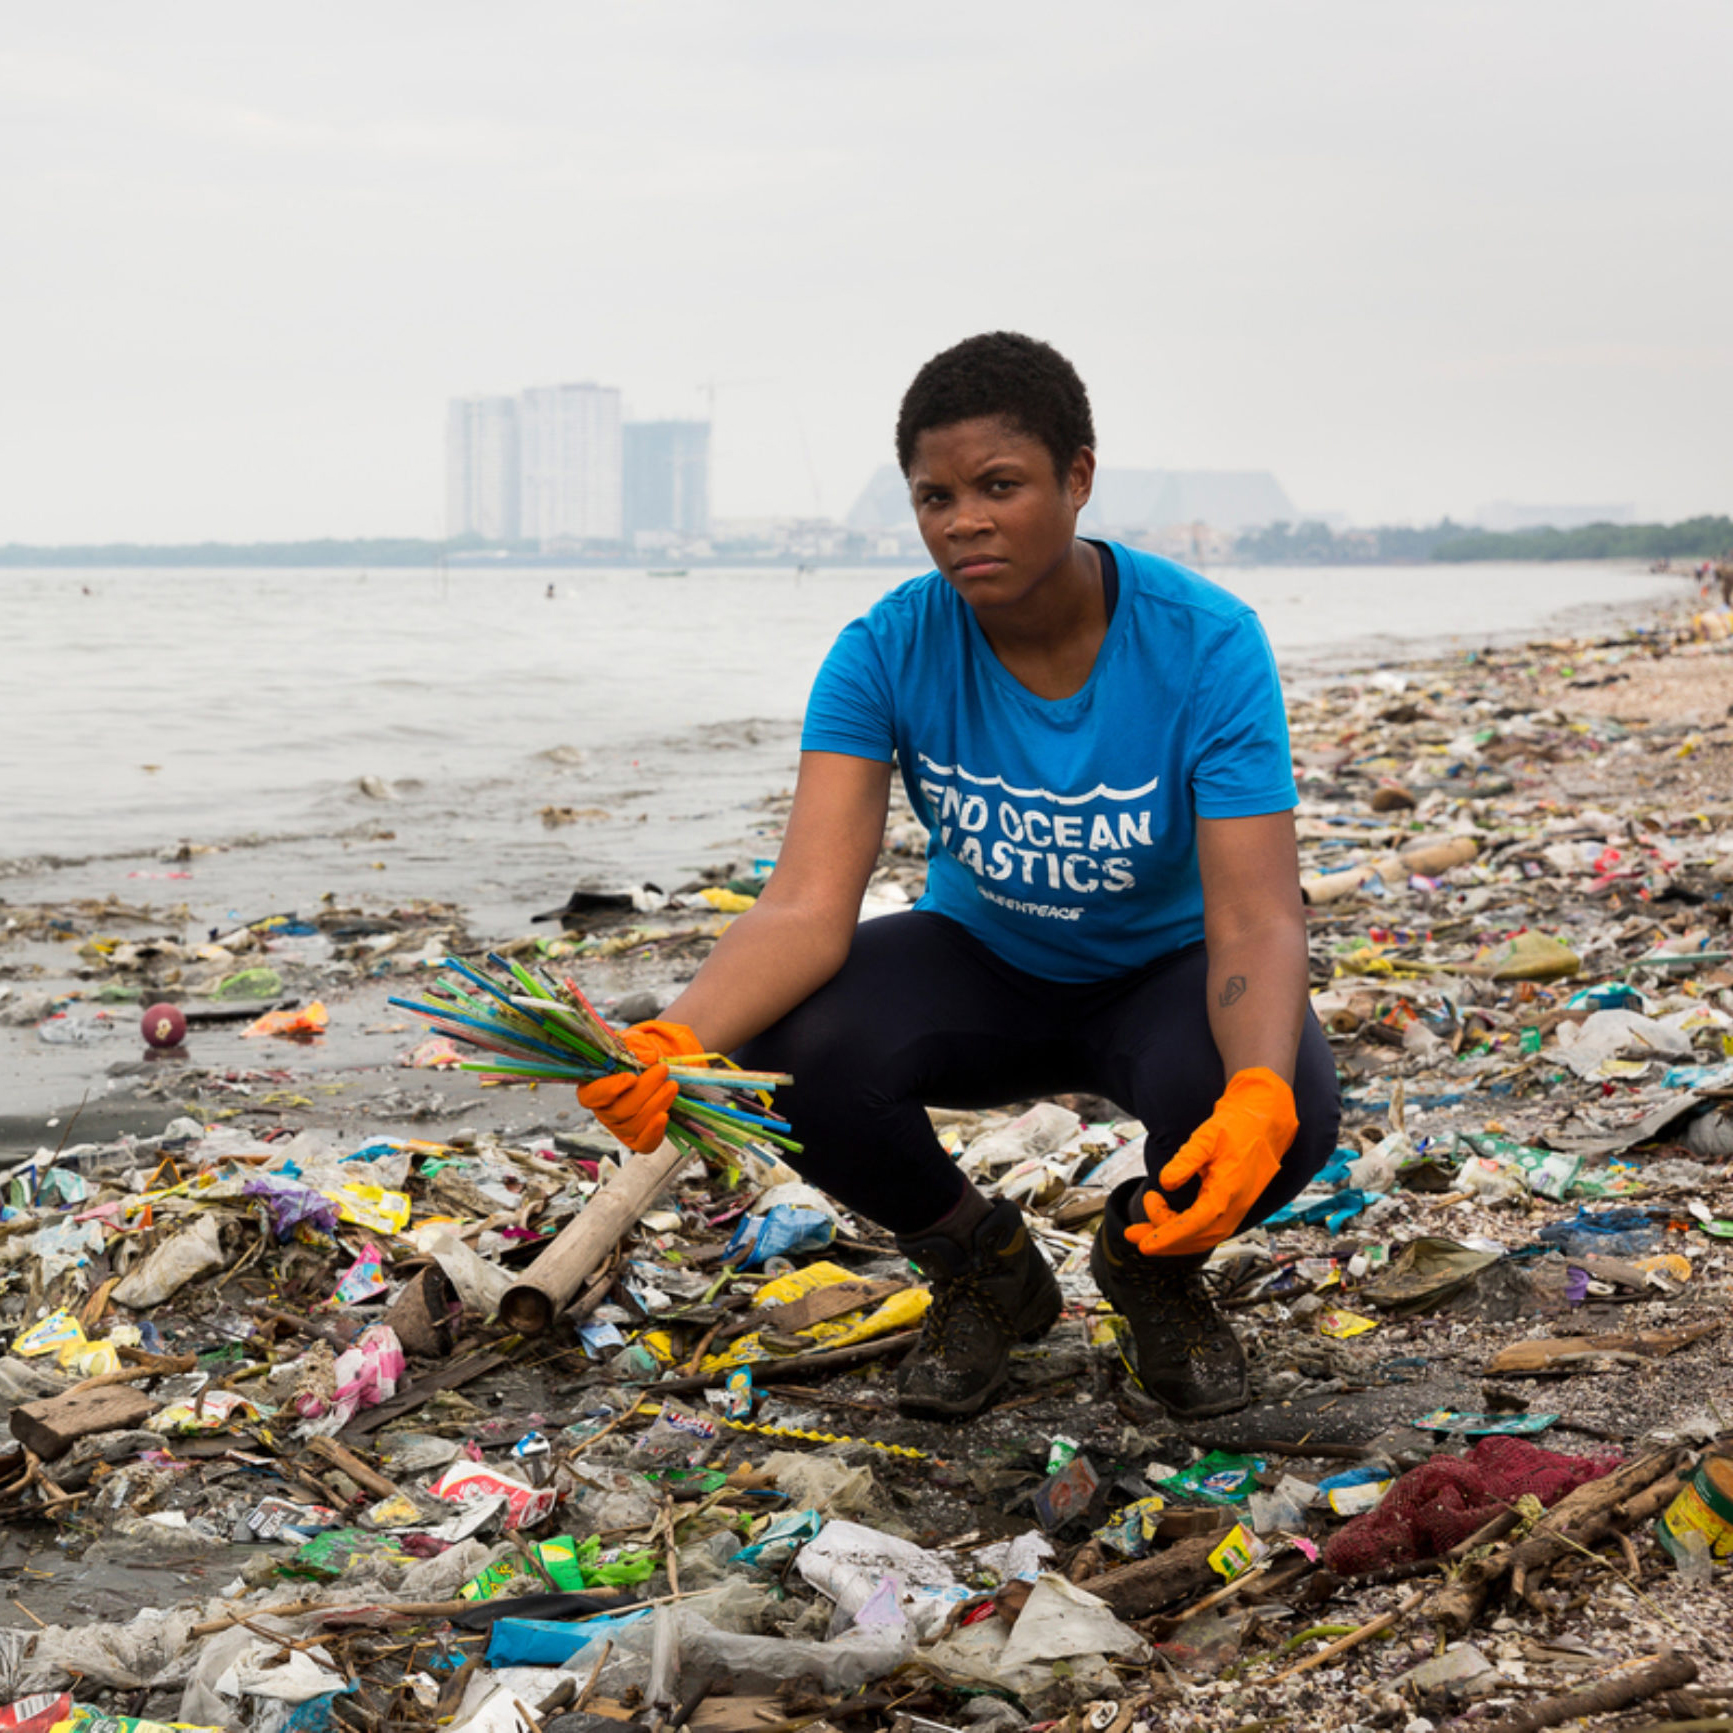 End Ocean Plastics